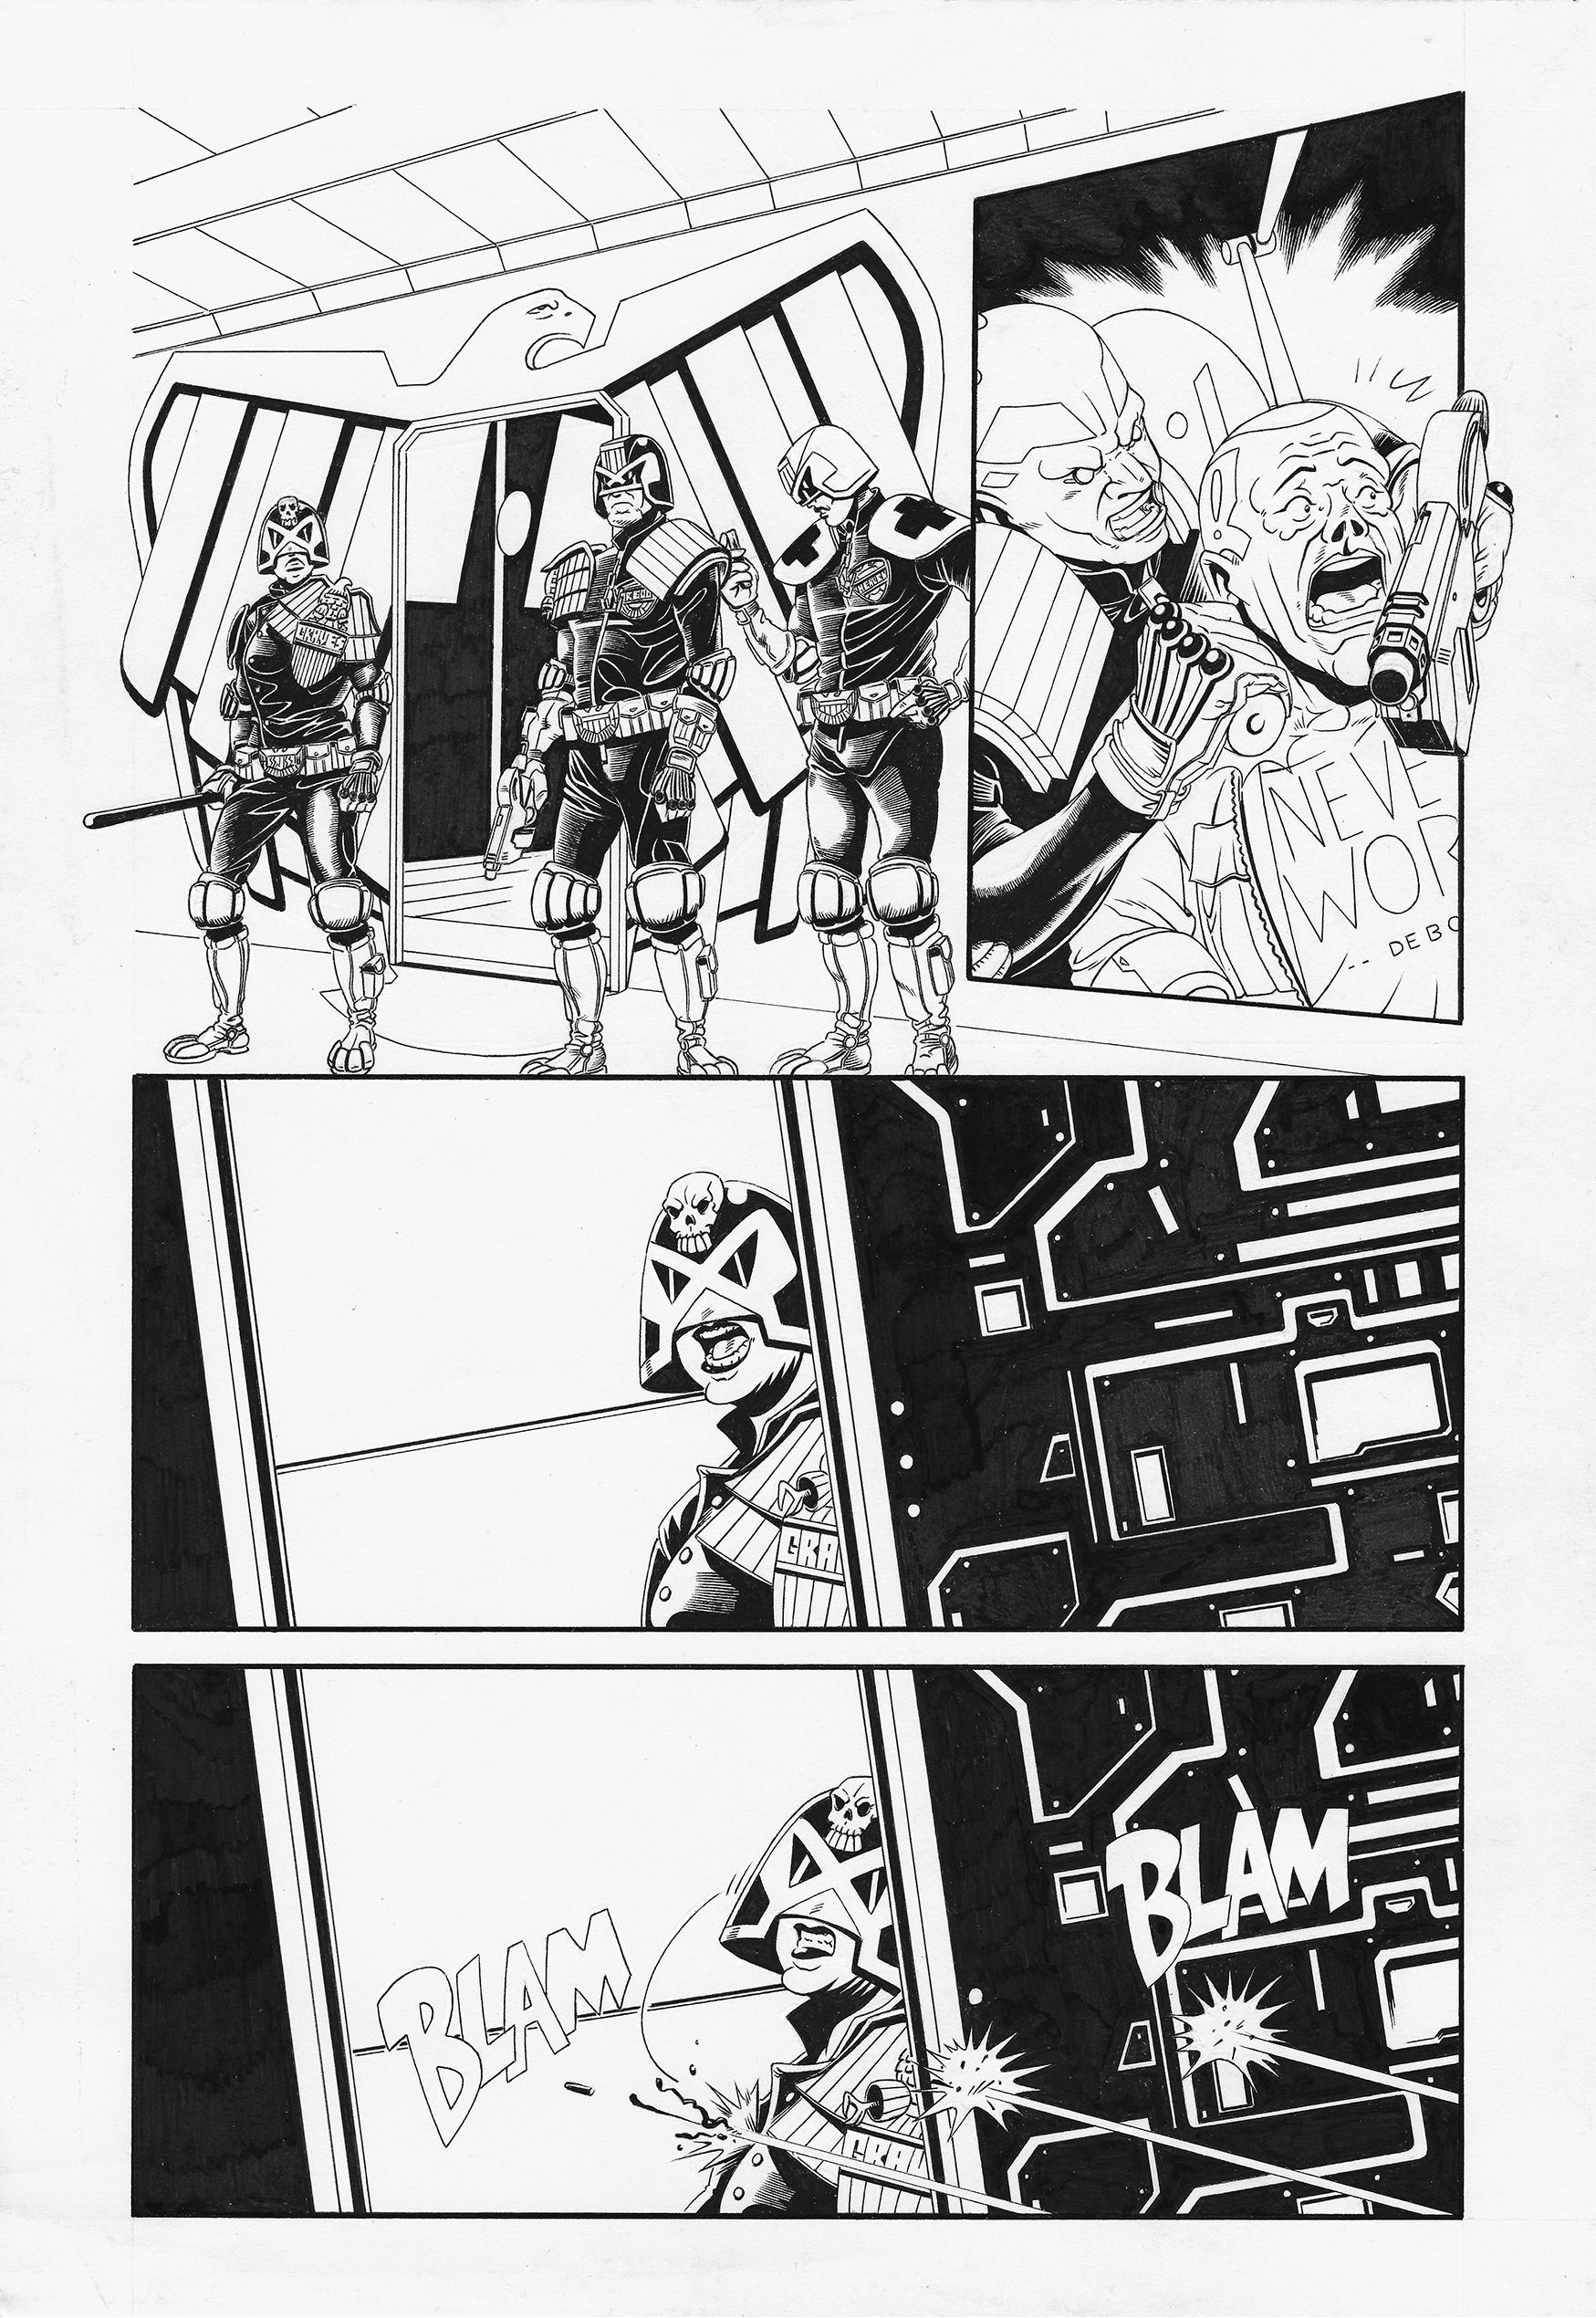 Judge Dredd: Interrogation 2 by AaronSmurfMurphy